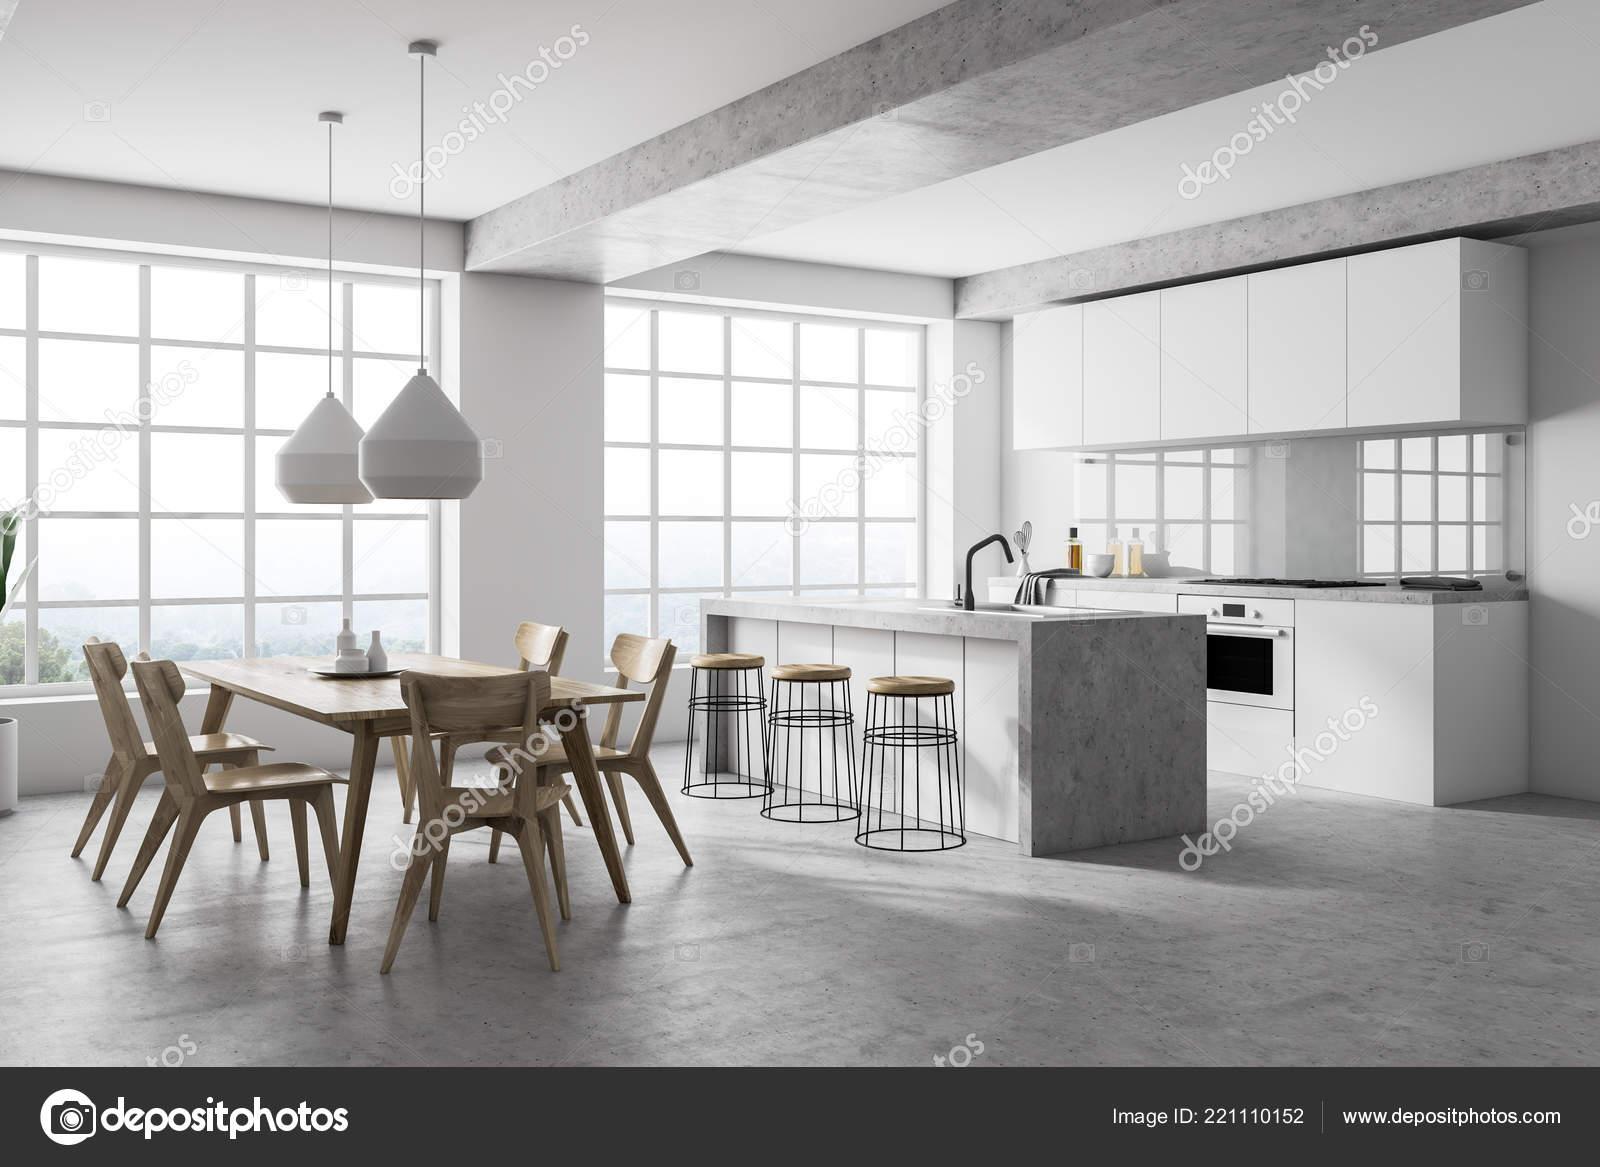 concrete kitchen table porcelain tile floor 现代厨房的侧视图白色墙壁混凝土地板白色台面一个岛屿一张桌子椅子和两个 现代厨房的侧视图白色墙壁混凝土地板白色台面一个岛屿一张桌子